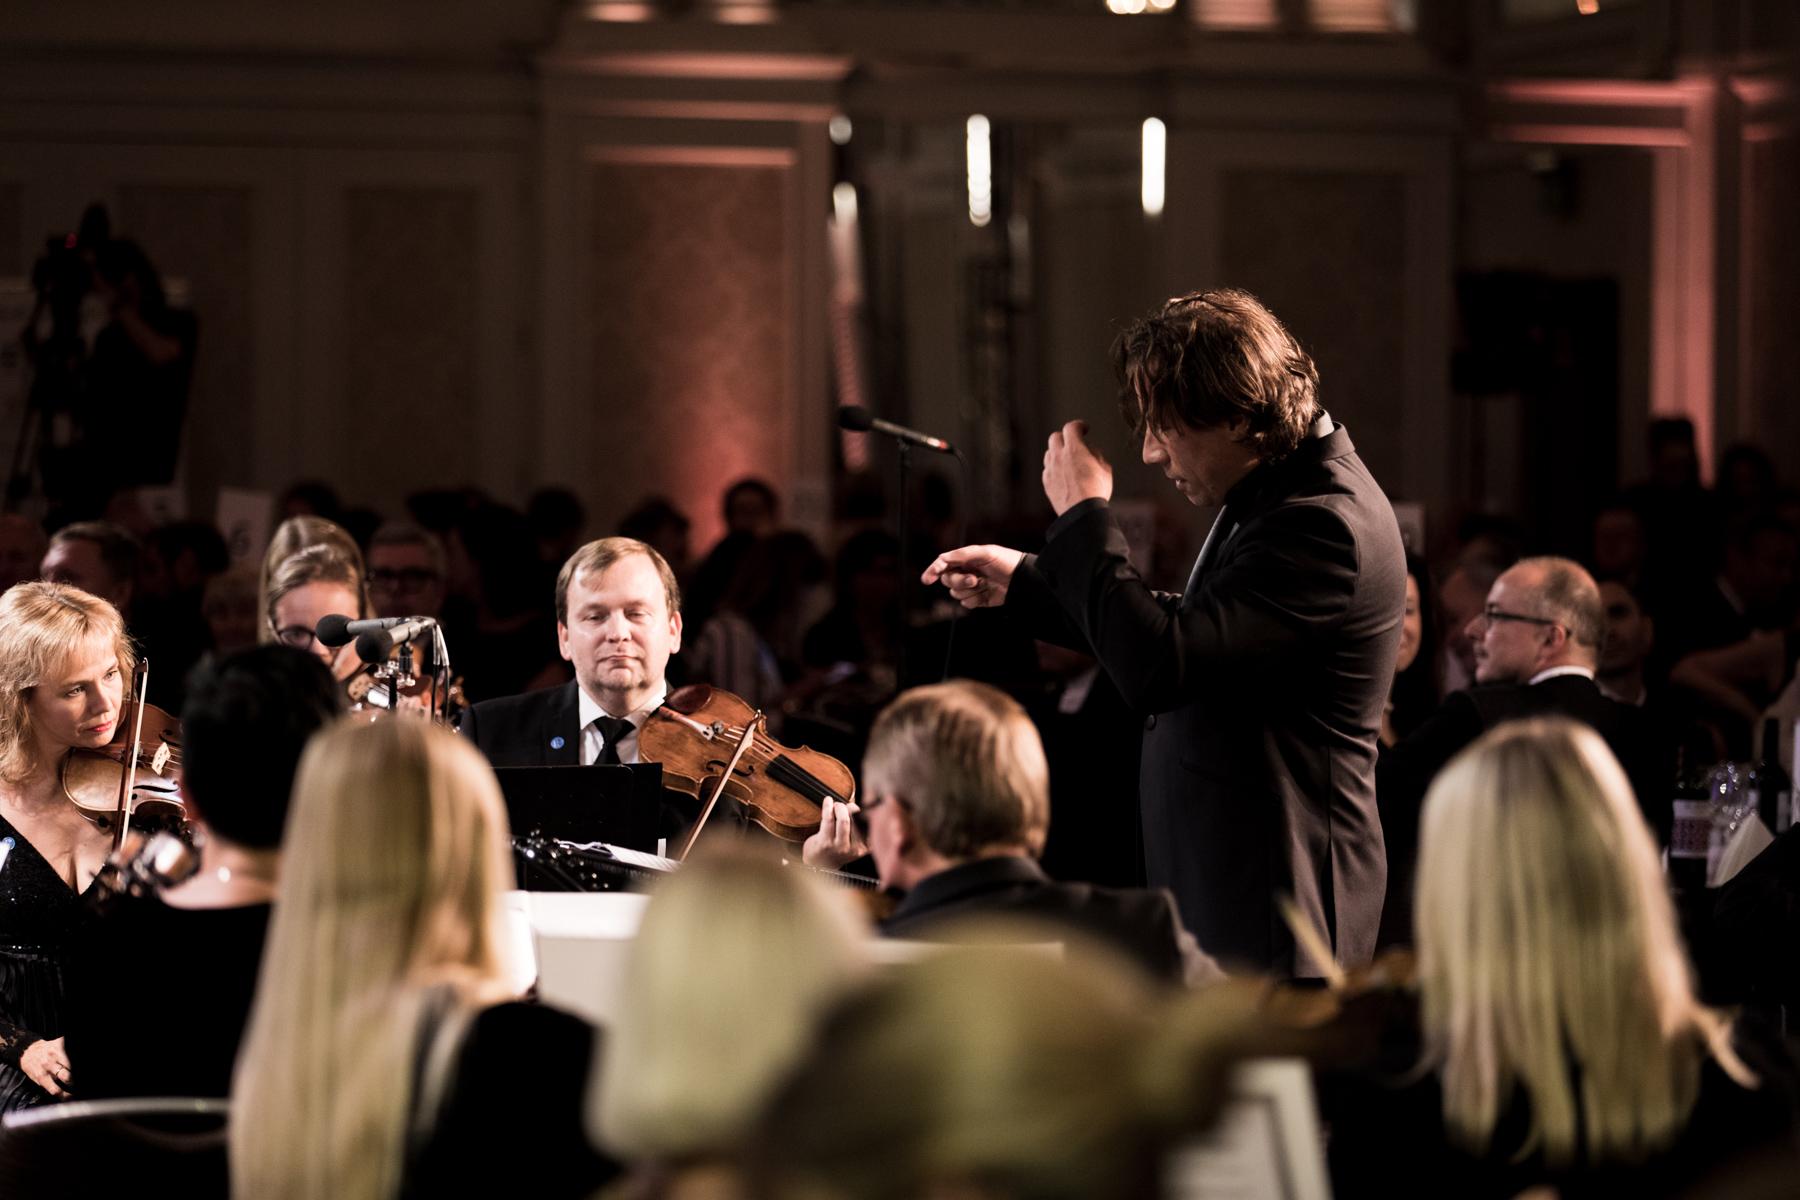 Kristjan Järvi conducts the Estonian National Symphony Orchestra